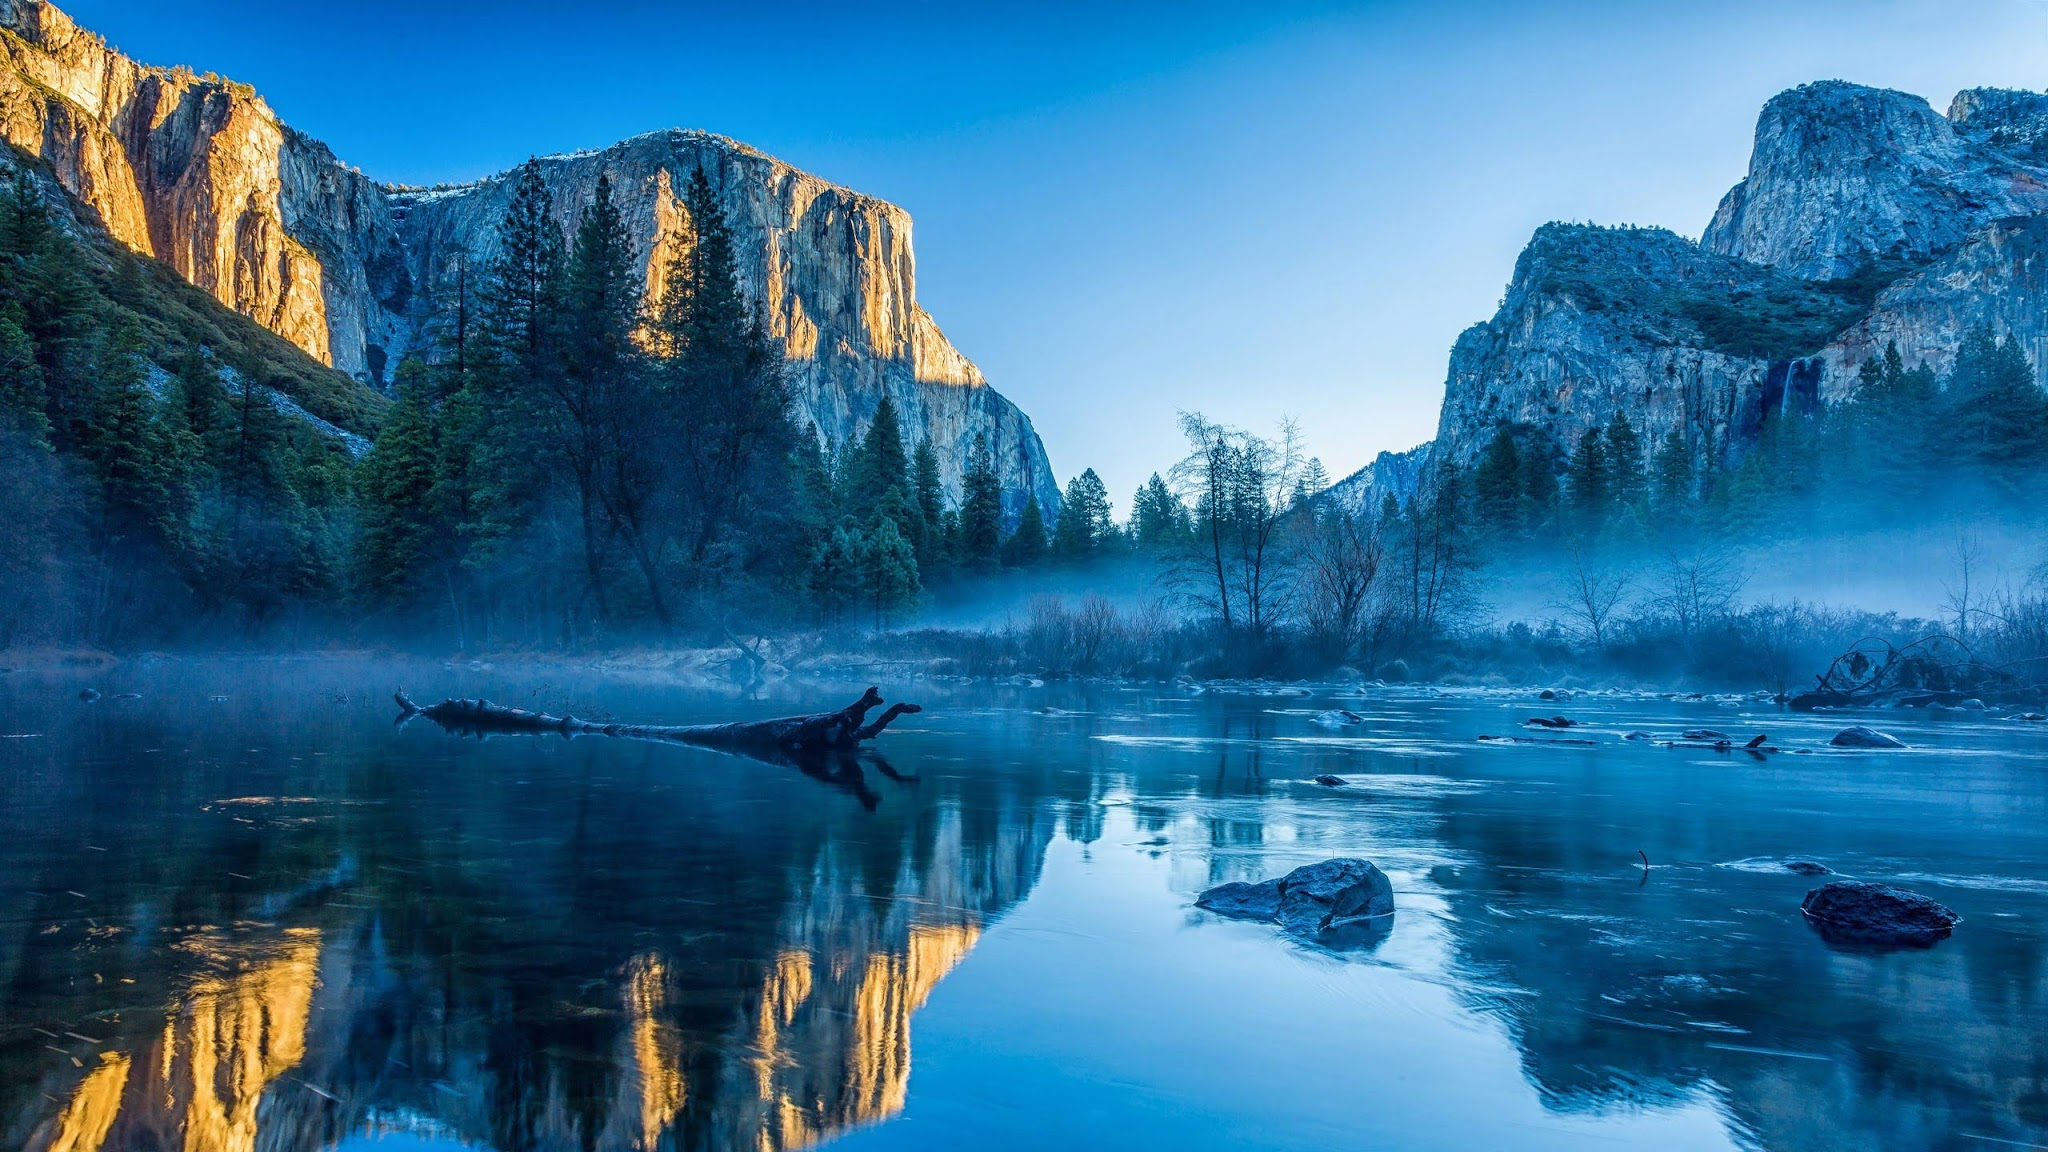 Imagem para relaxar lago azul papel de parede gr tis for Papel de pared paisajes